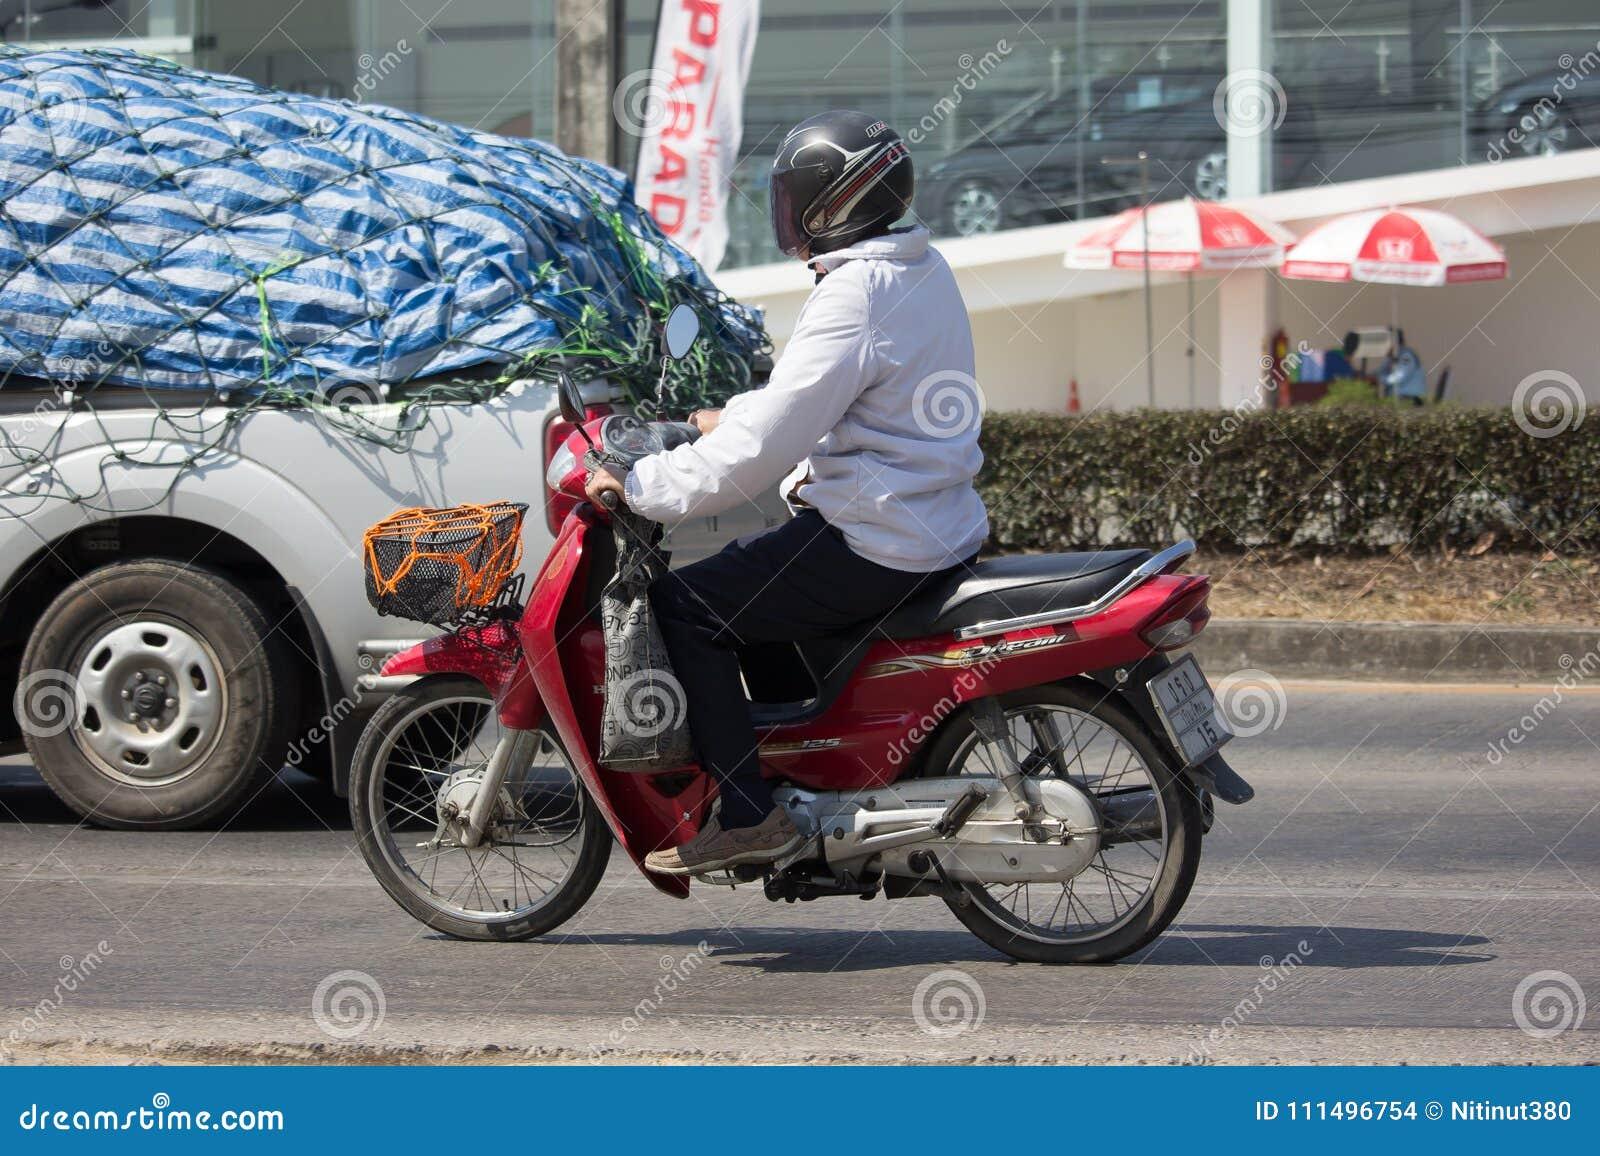 Private Motorcycle, Honda Dream Editorial Stock Image ...